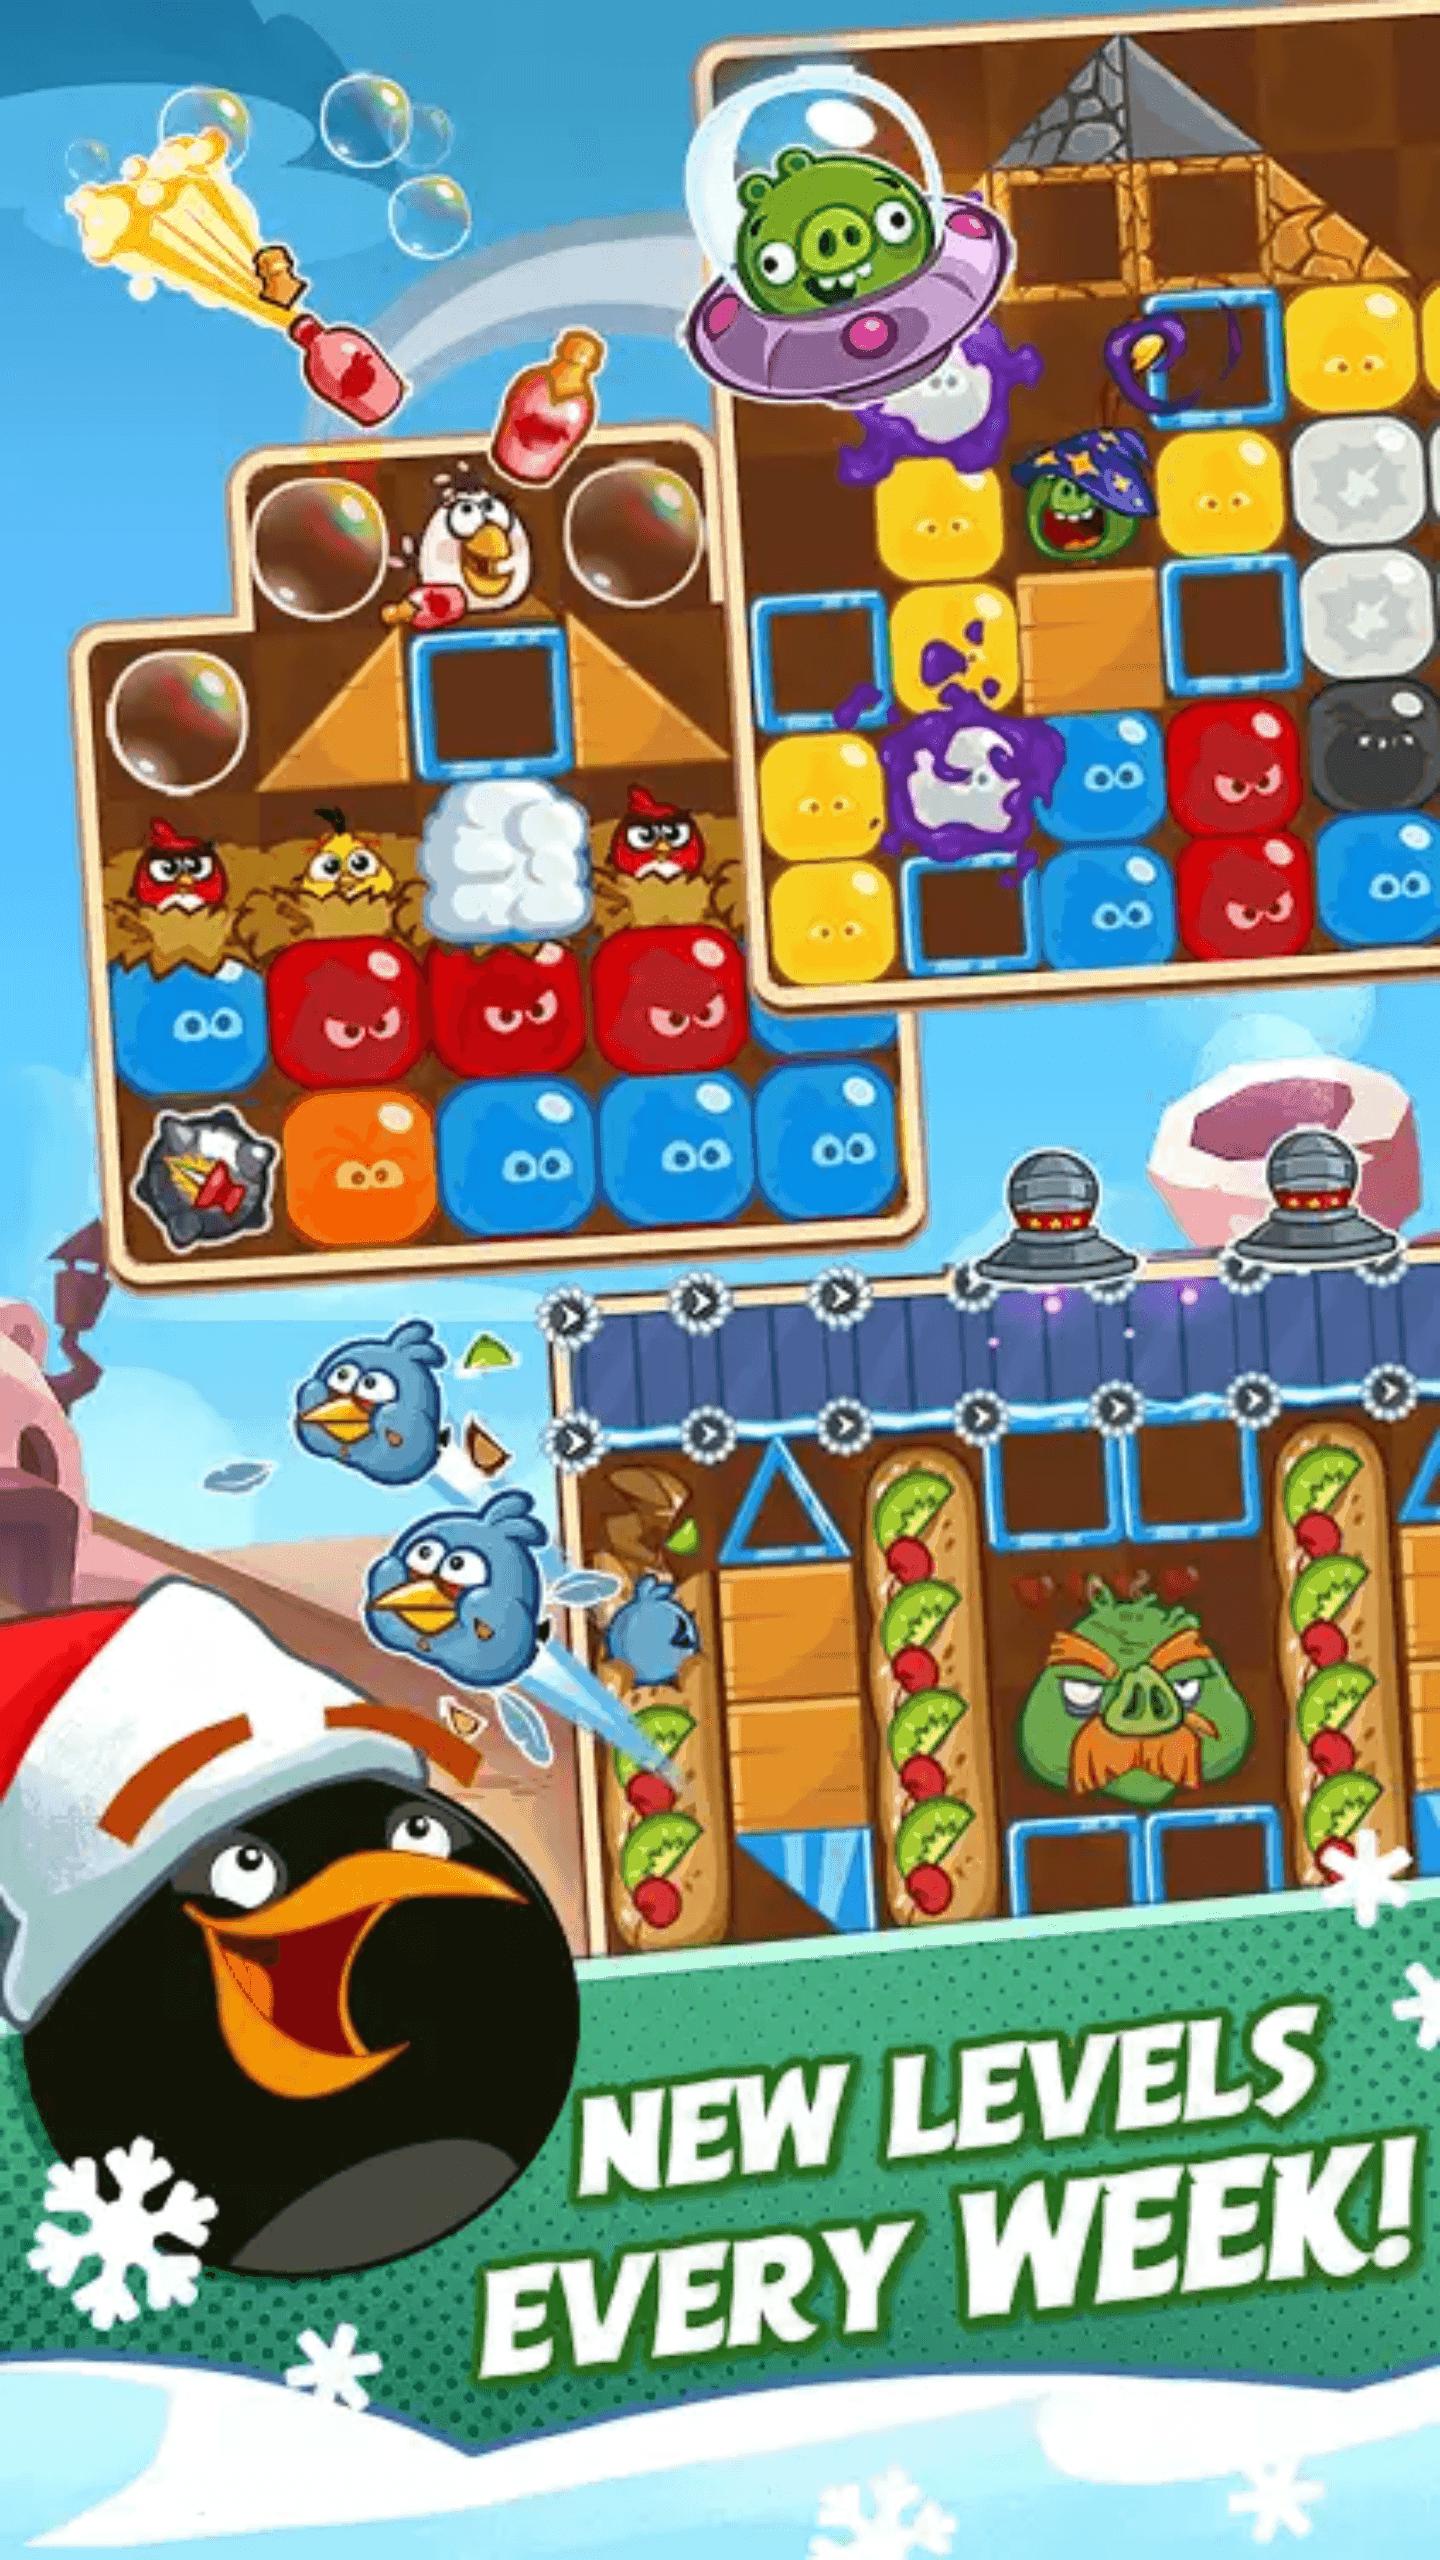 Angry Birds Blast Screenshot 03